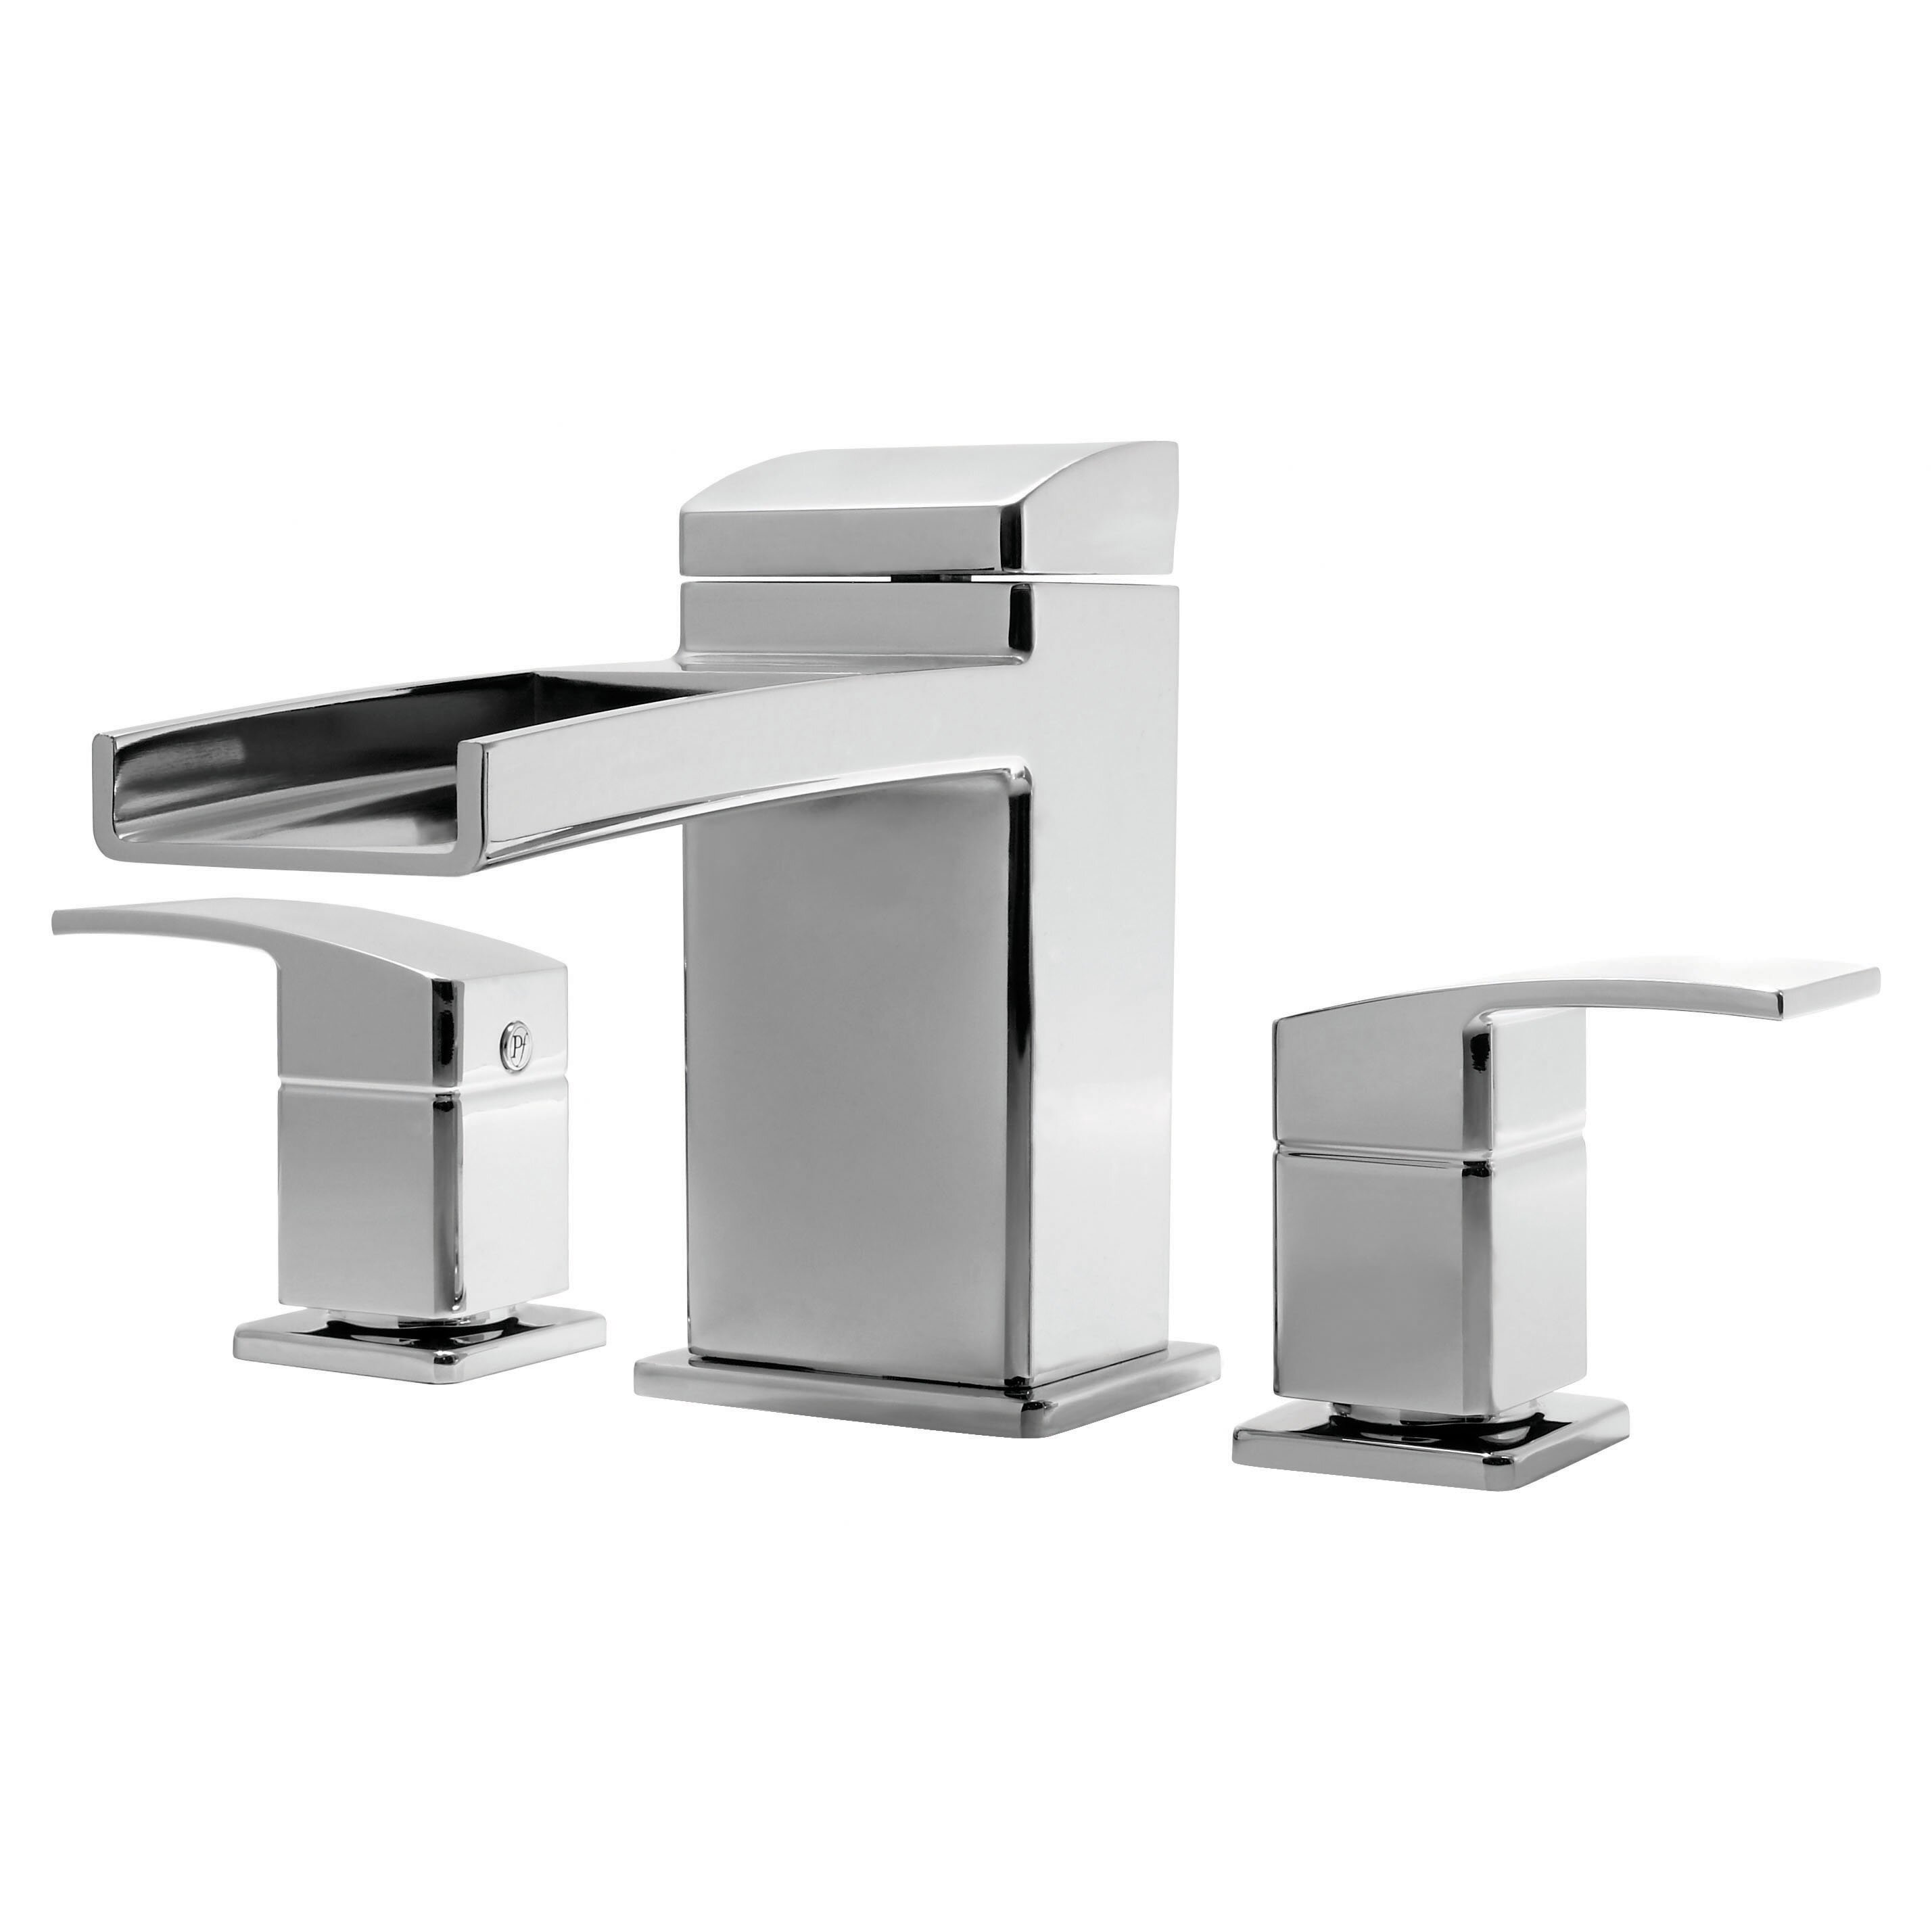 pfister c pfister kitchen faucets Kenzo Two Handle Deck Mount Roman Tub Faucet Trim